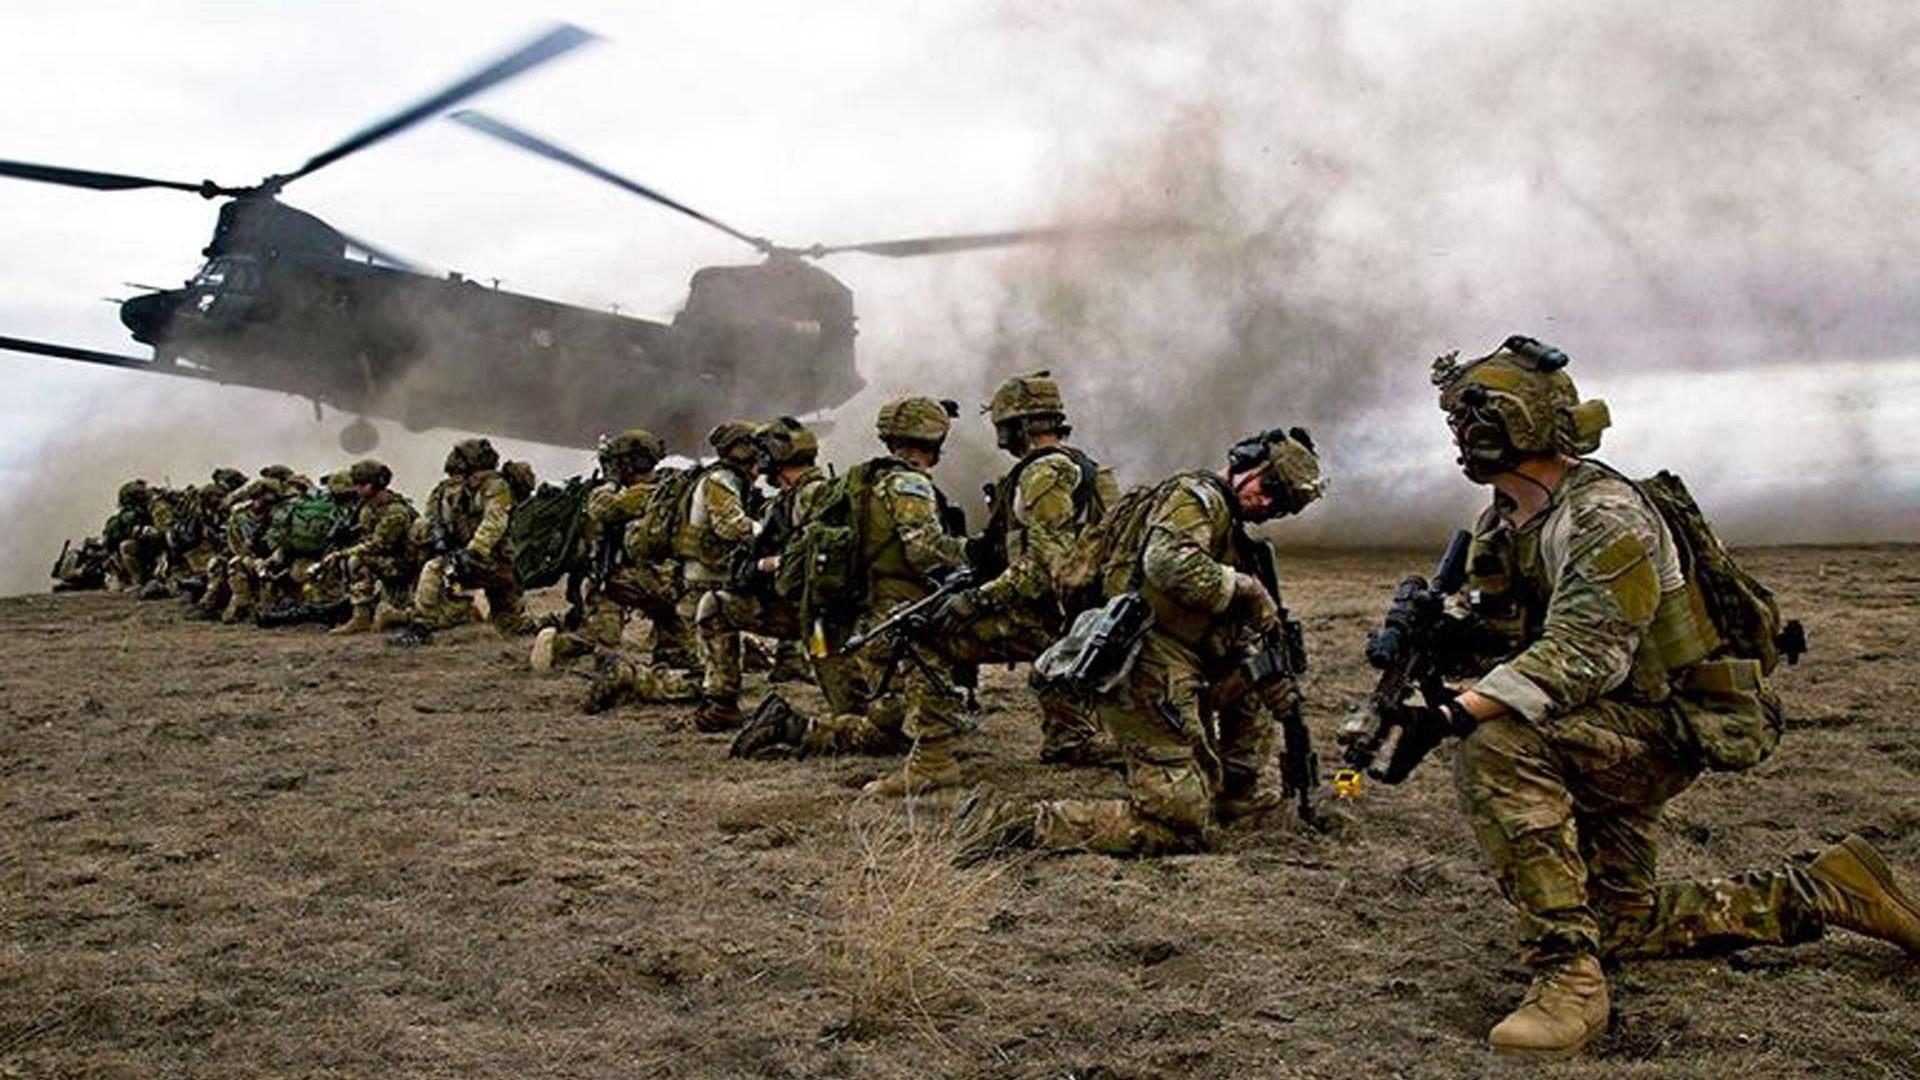 75th Ranger Regiment Wallpaper 74 Images